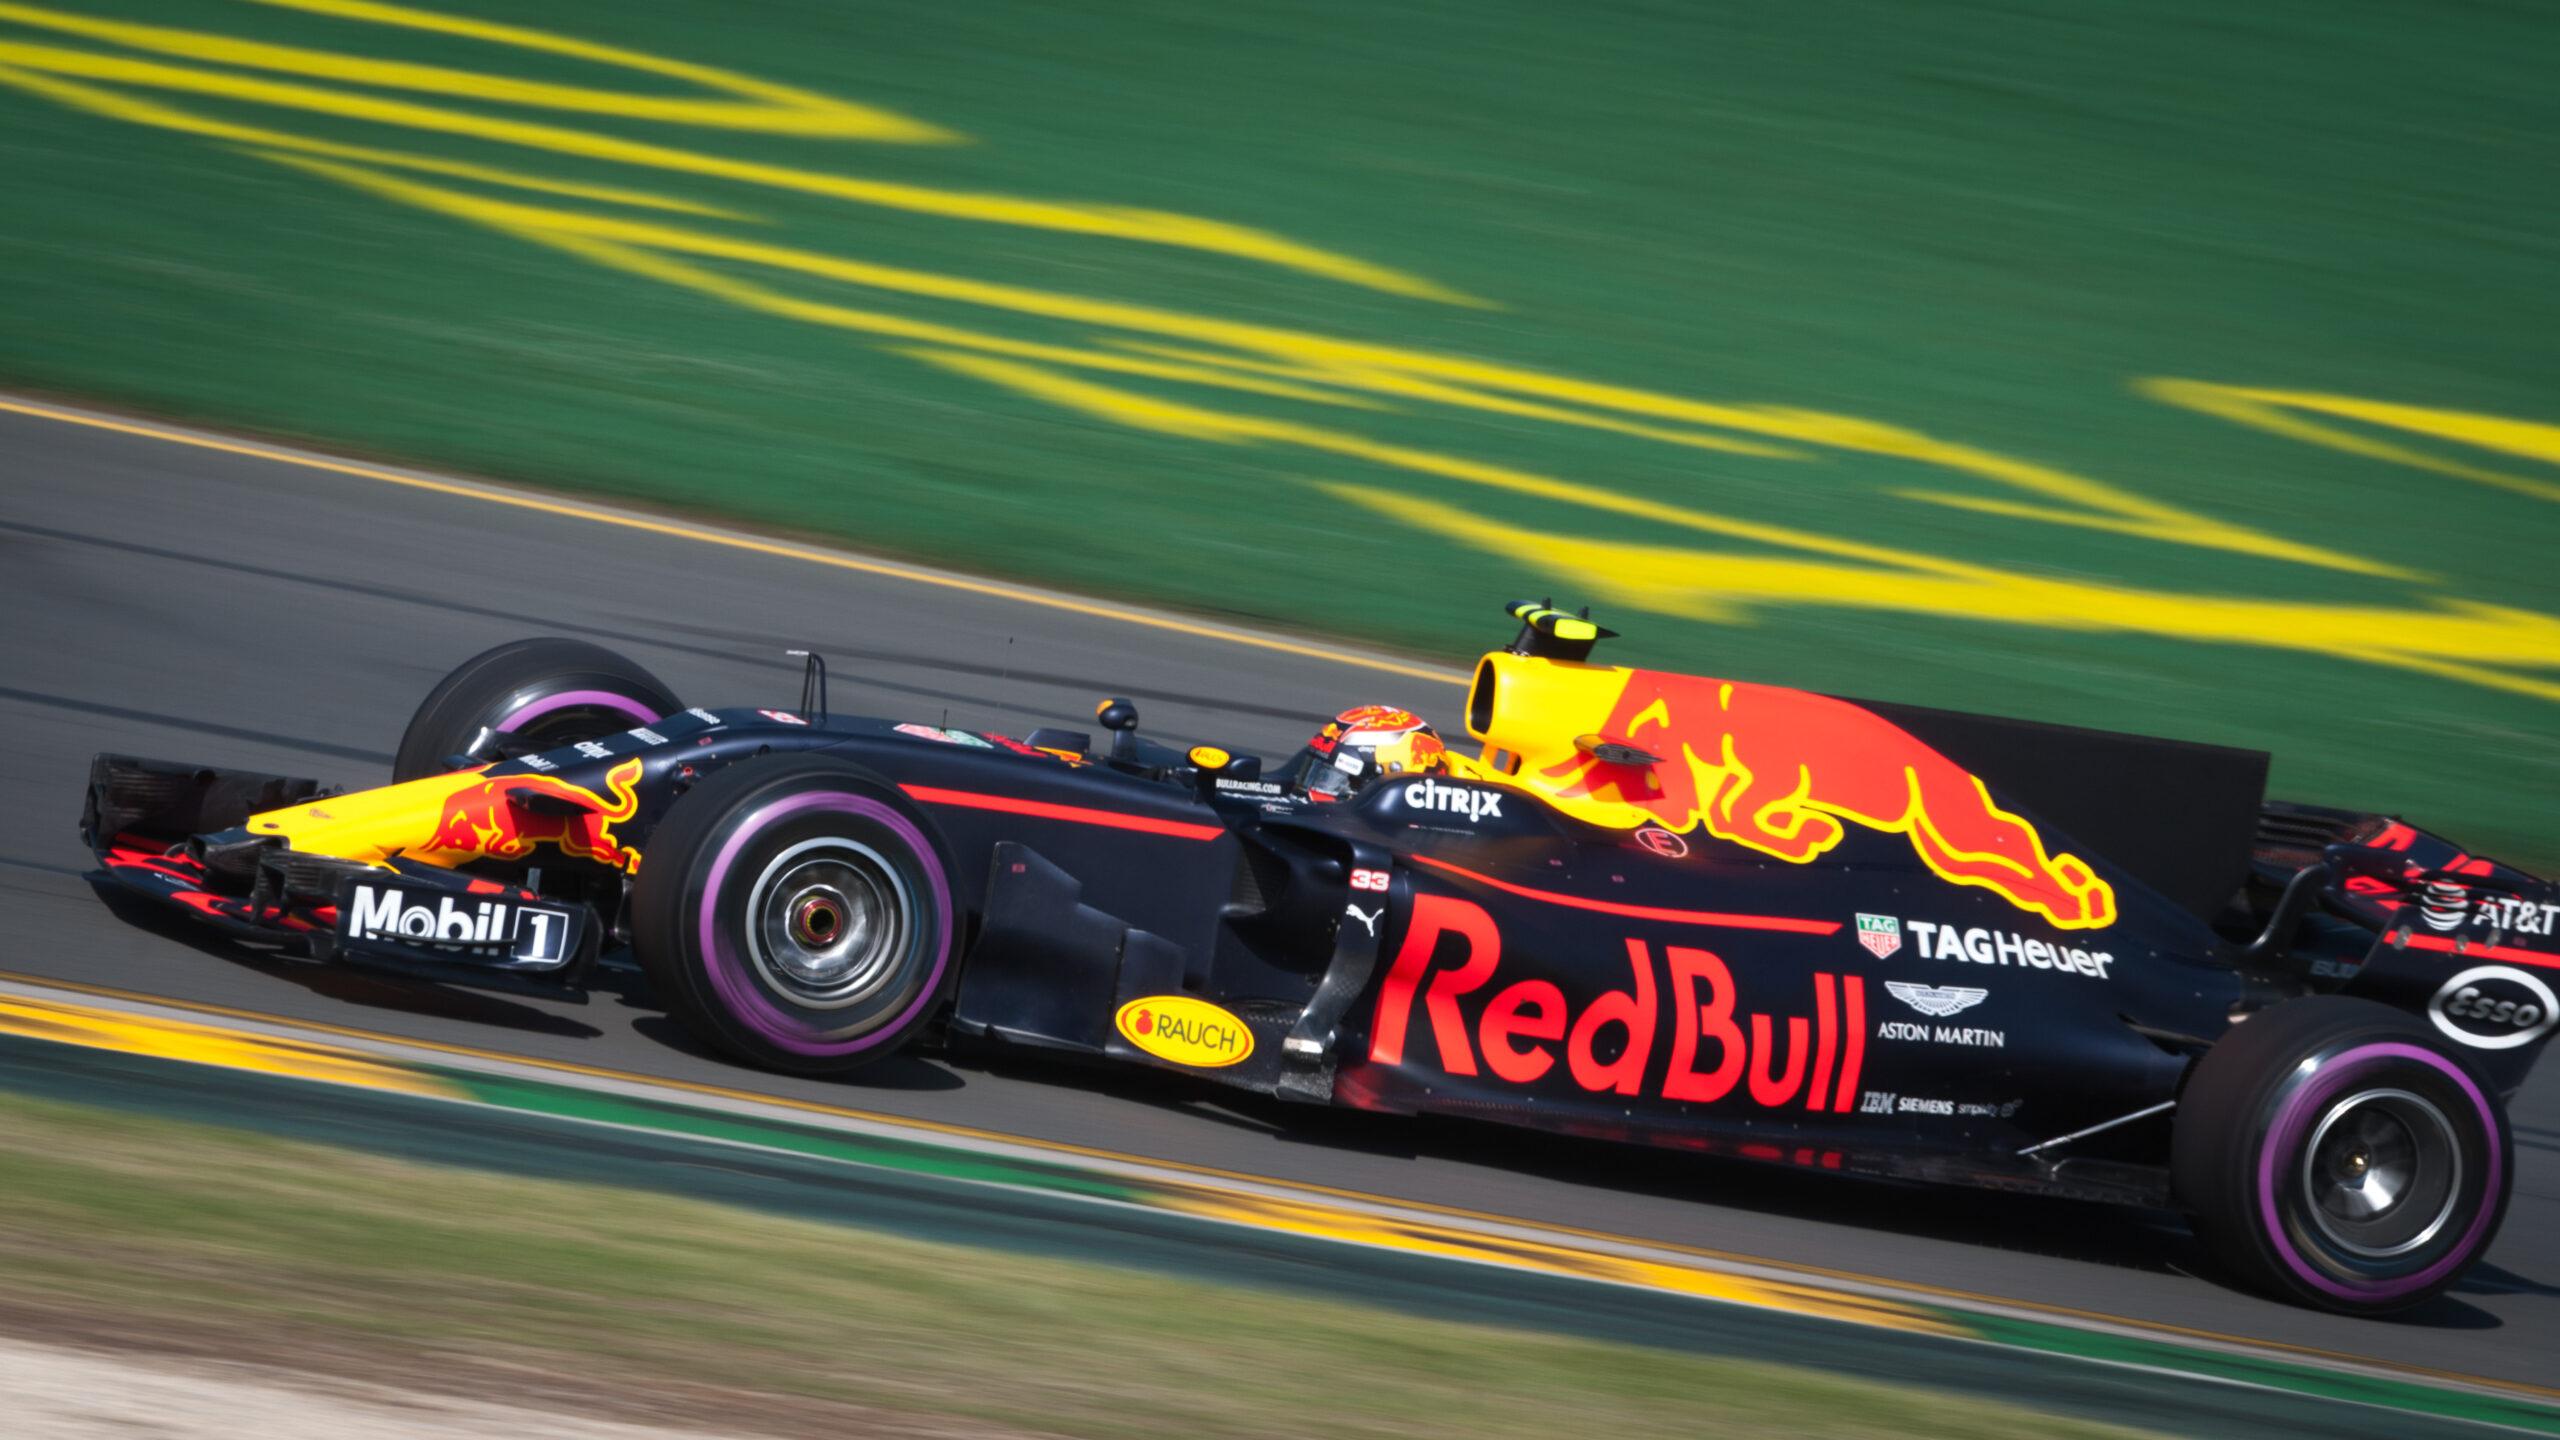 F1 Canada 2021 – Red Bull Racing Paddock Club ™ Hospitality